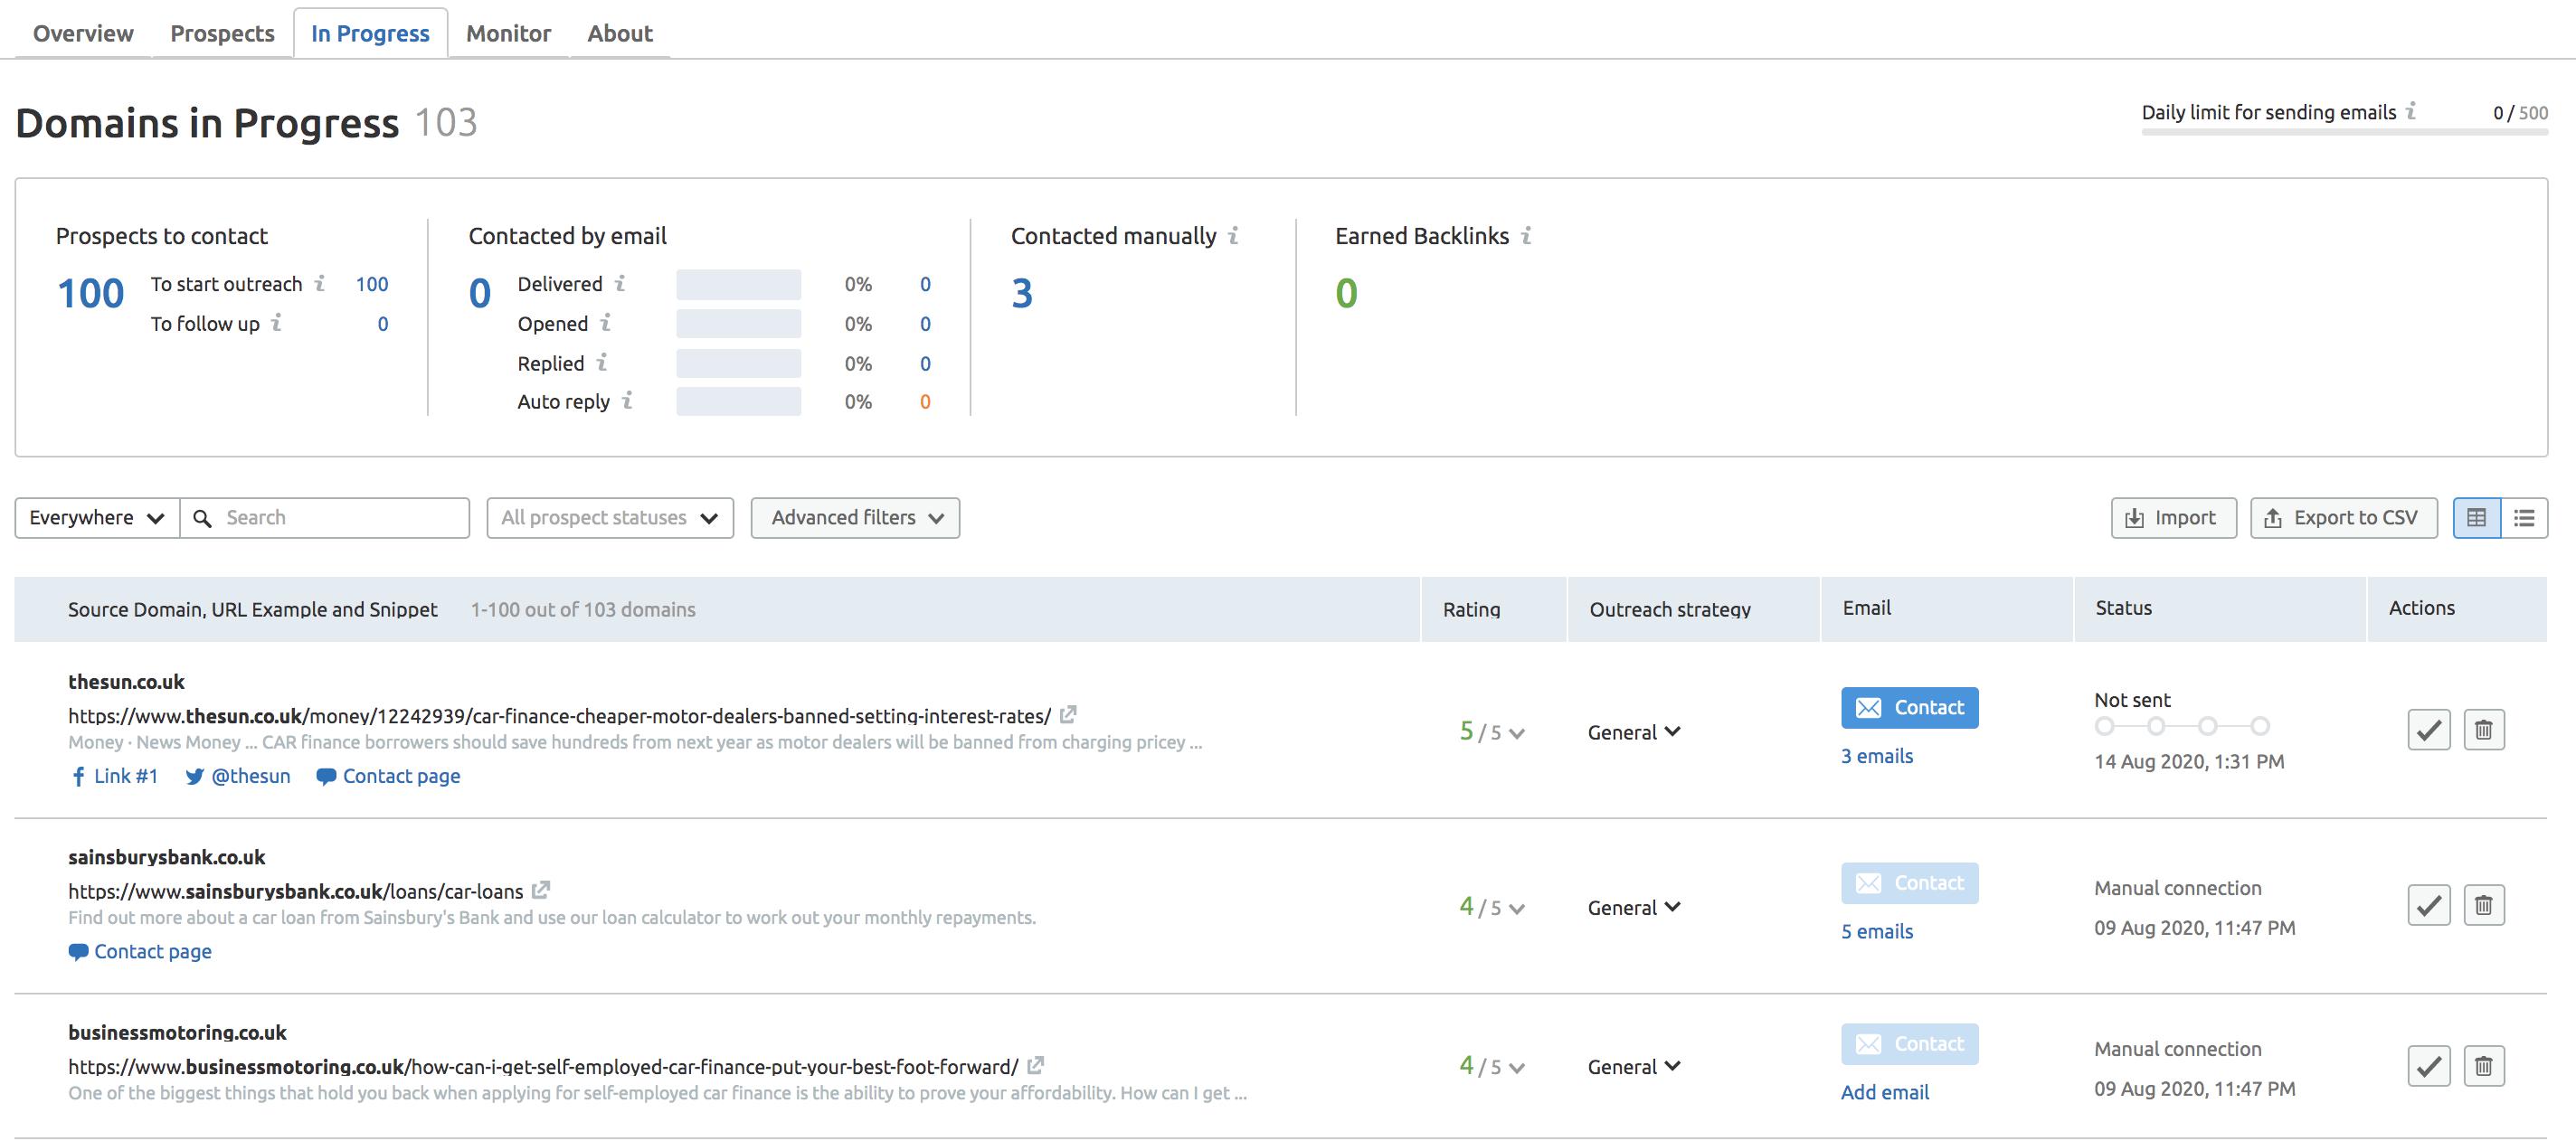 Domains in Progress Screenshot